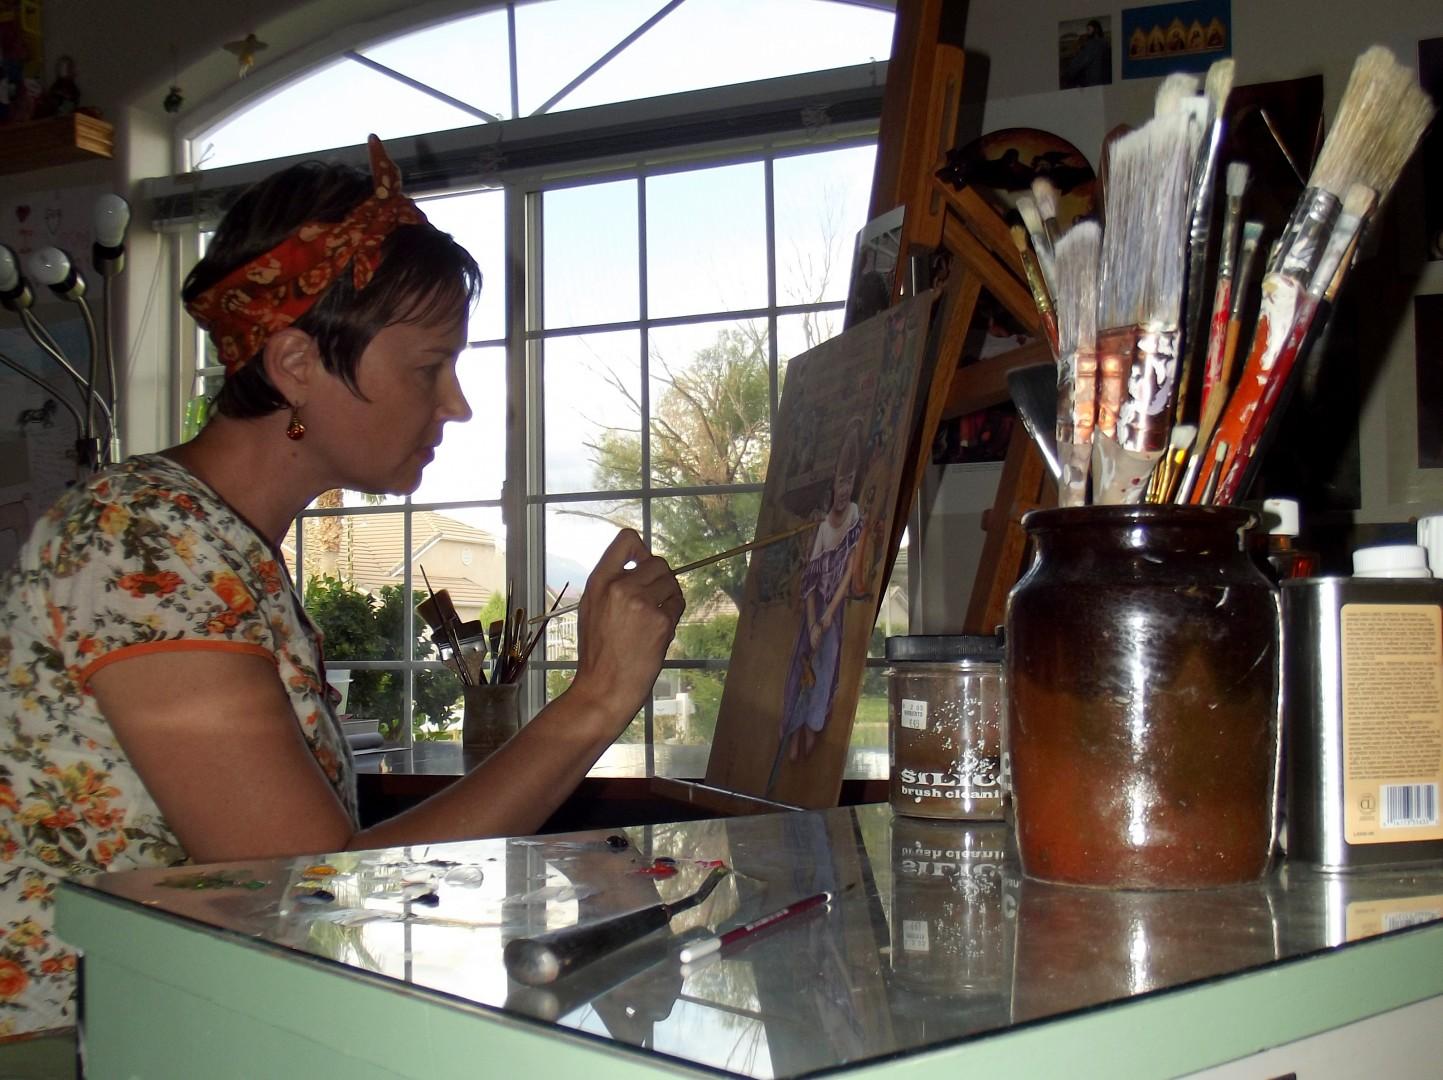 Kirsten Beitler, featured artist in the Arts to Zion tour Jan. 17-20, 2014, St. George, Utah   Photo courtesy of Arts to Zion tour, St. George News